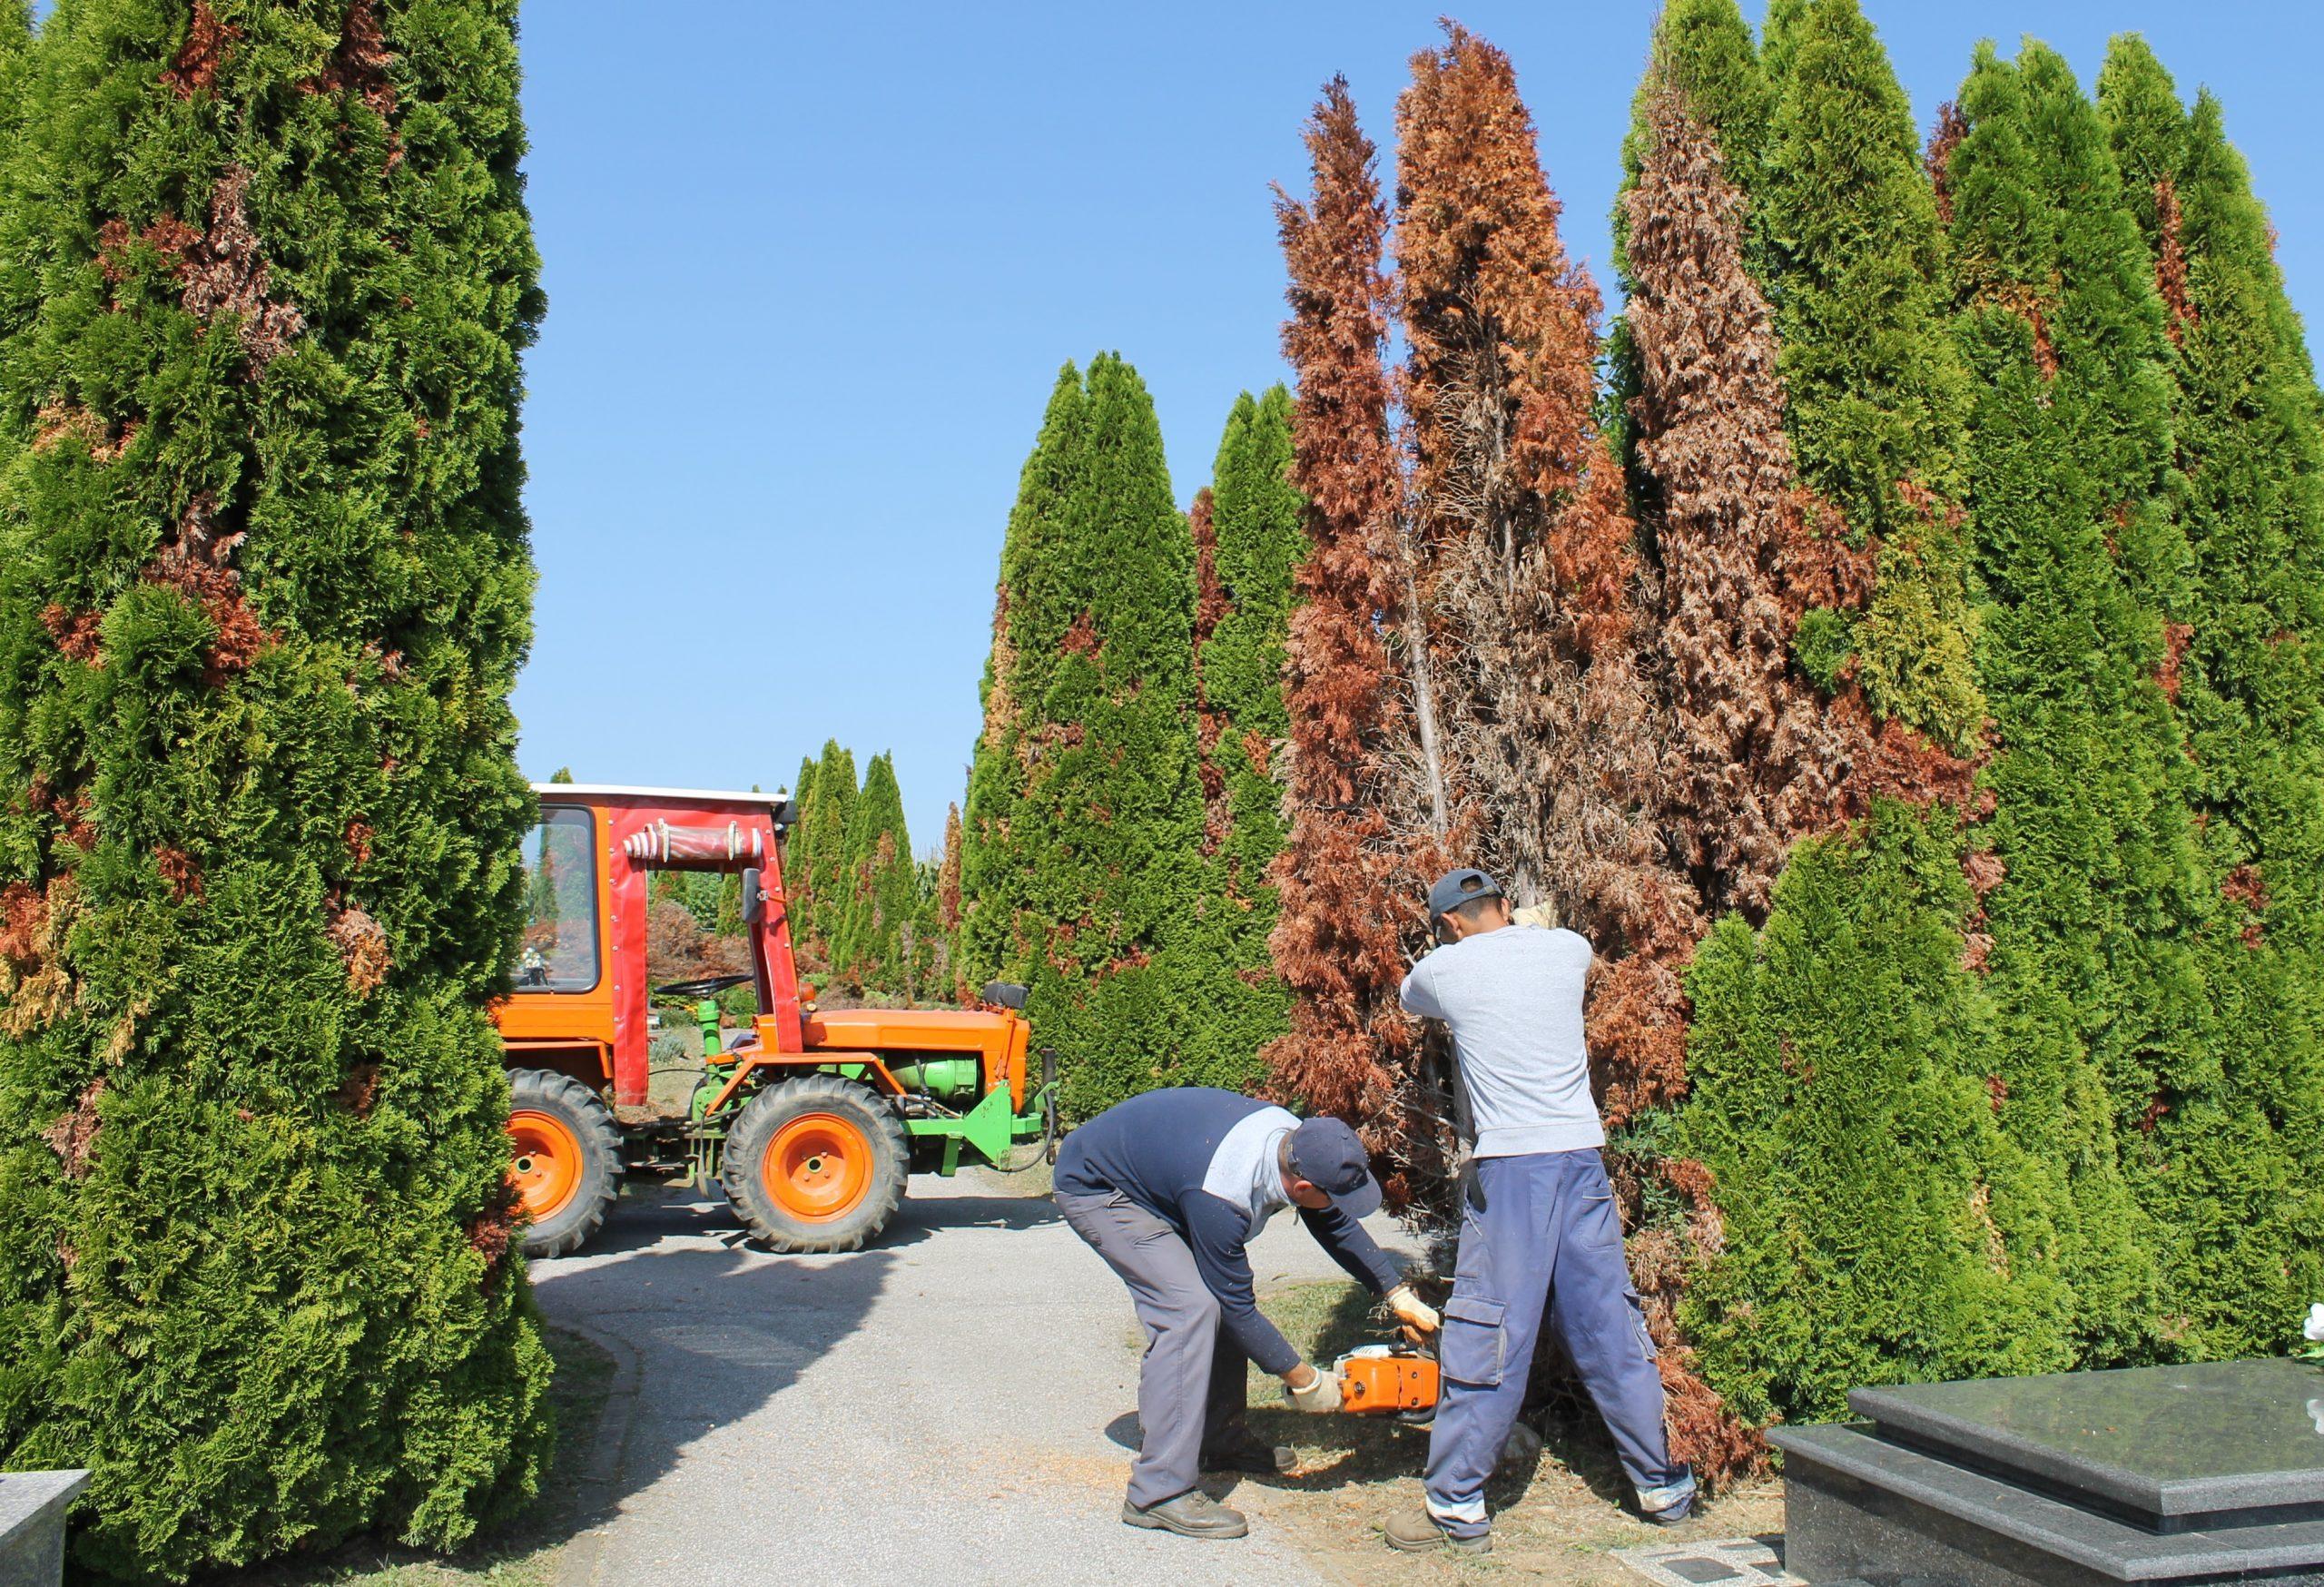 Na Gradskom groblju Pri Svetom Duhu u tijeku je revitalizacija zelenila